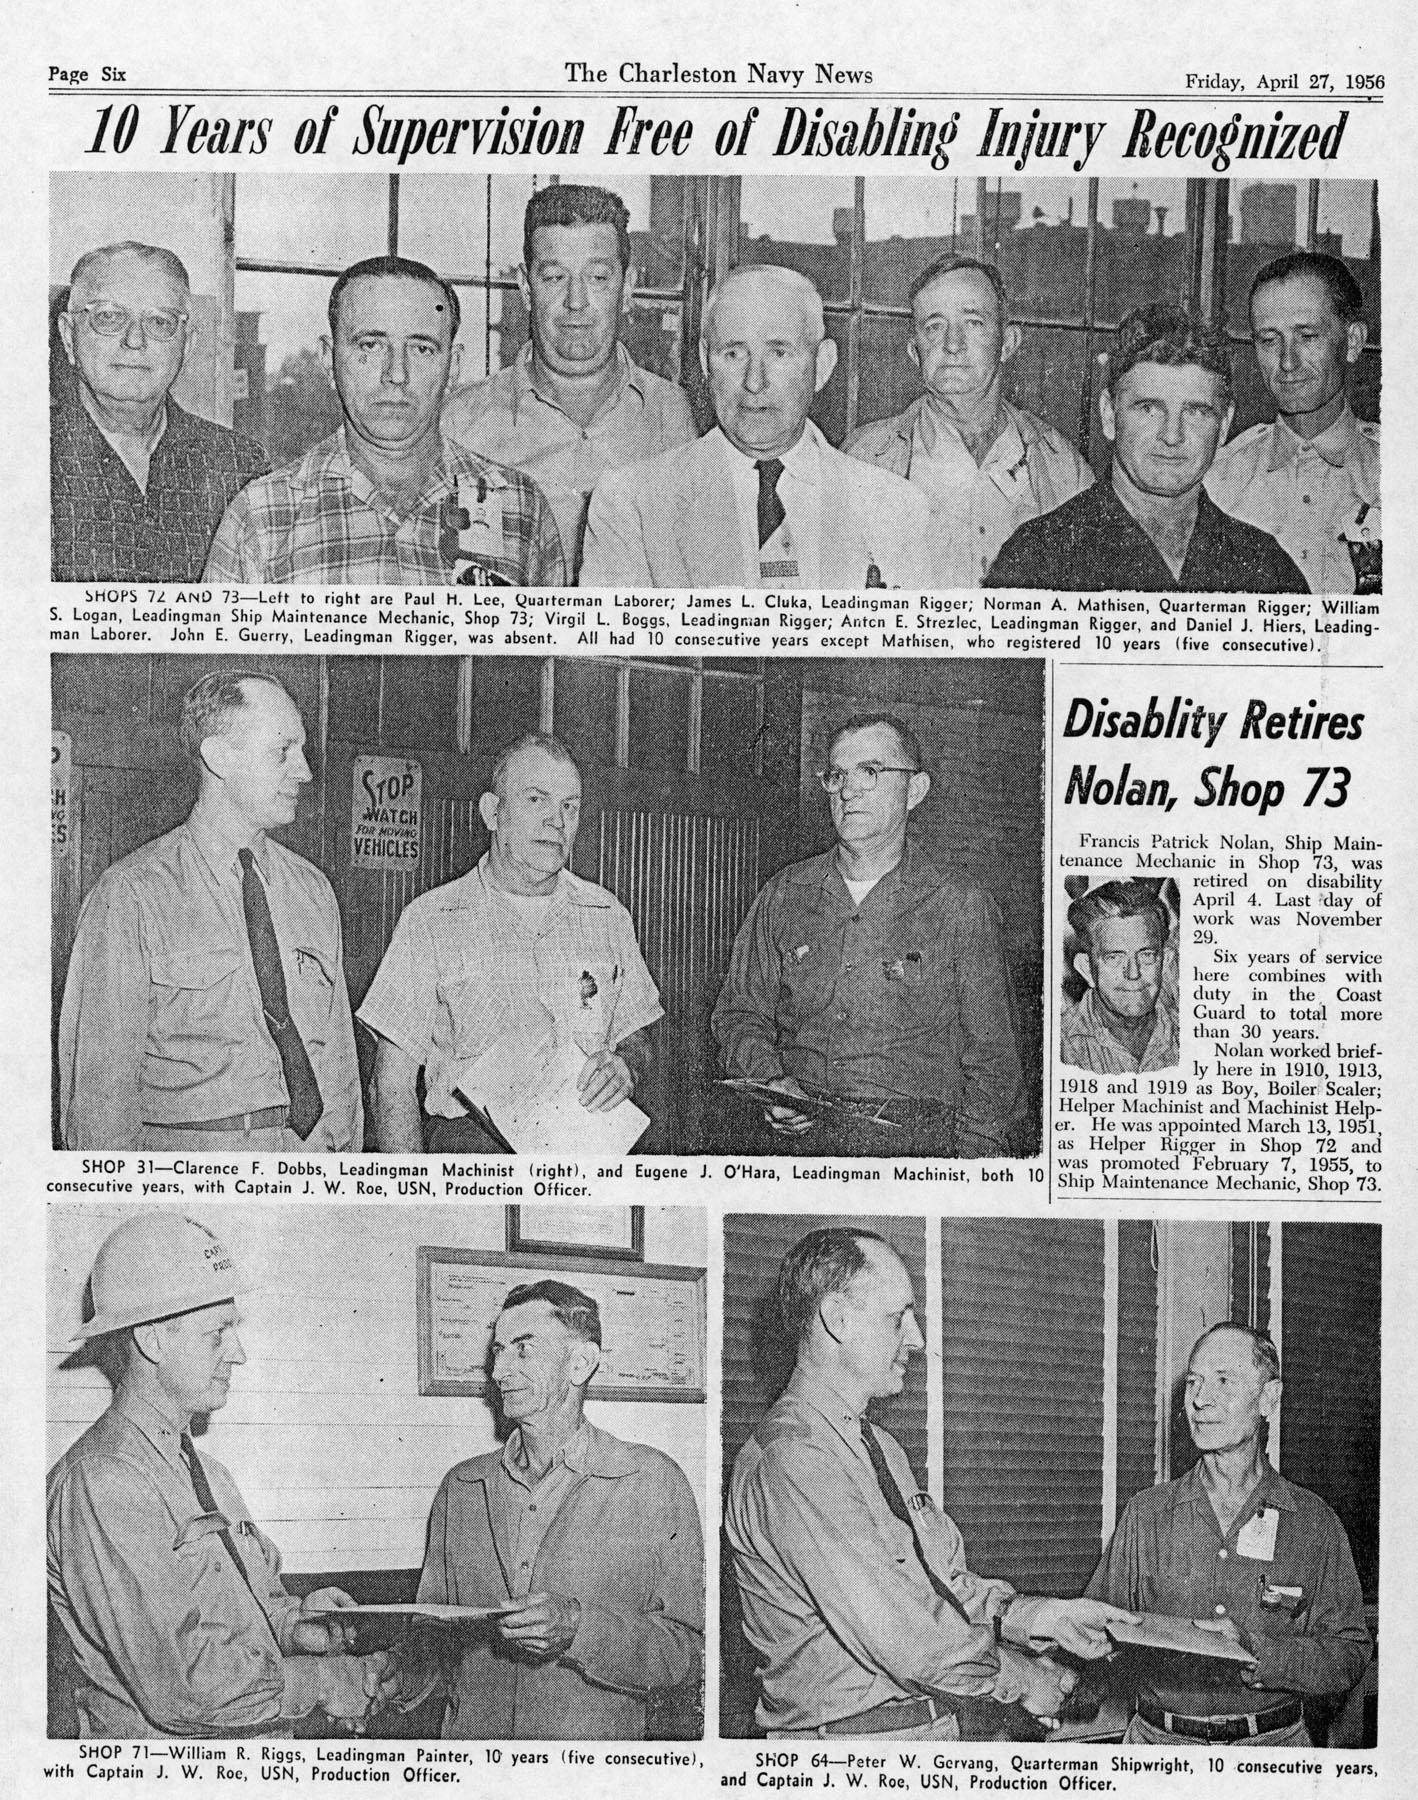 The Charleston Navy News, Volume 14, Edition 20, page vi